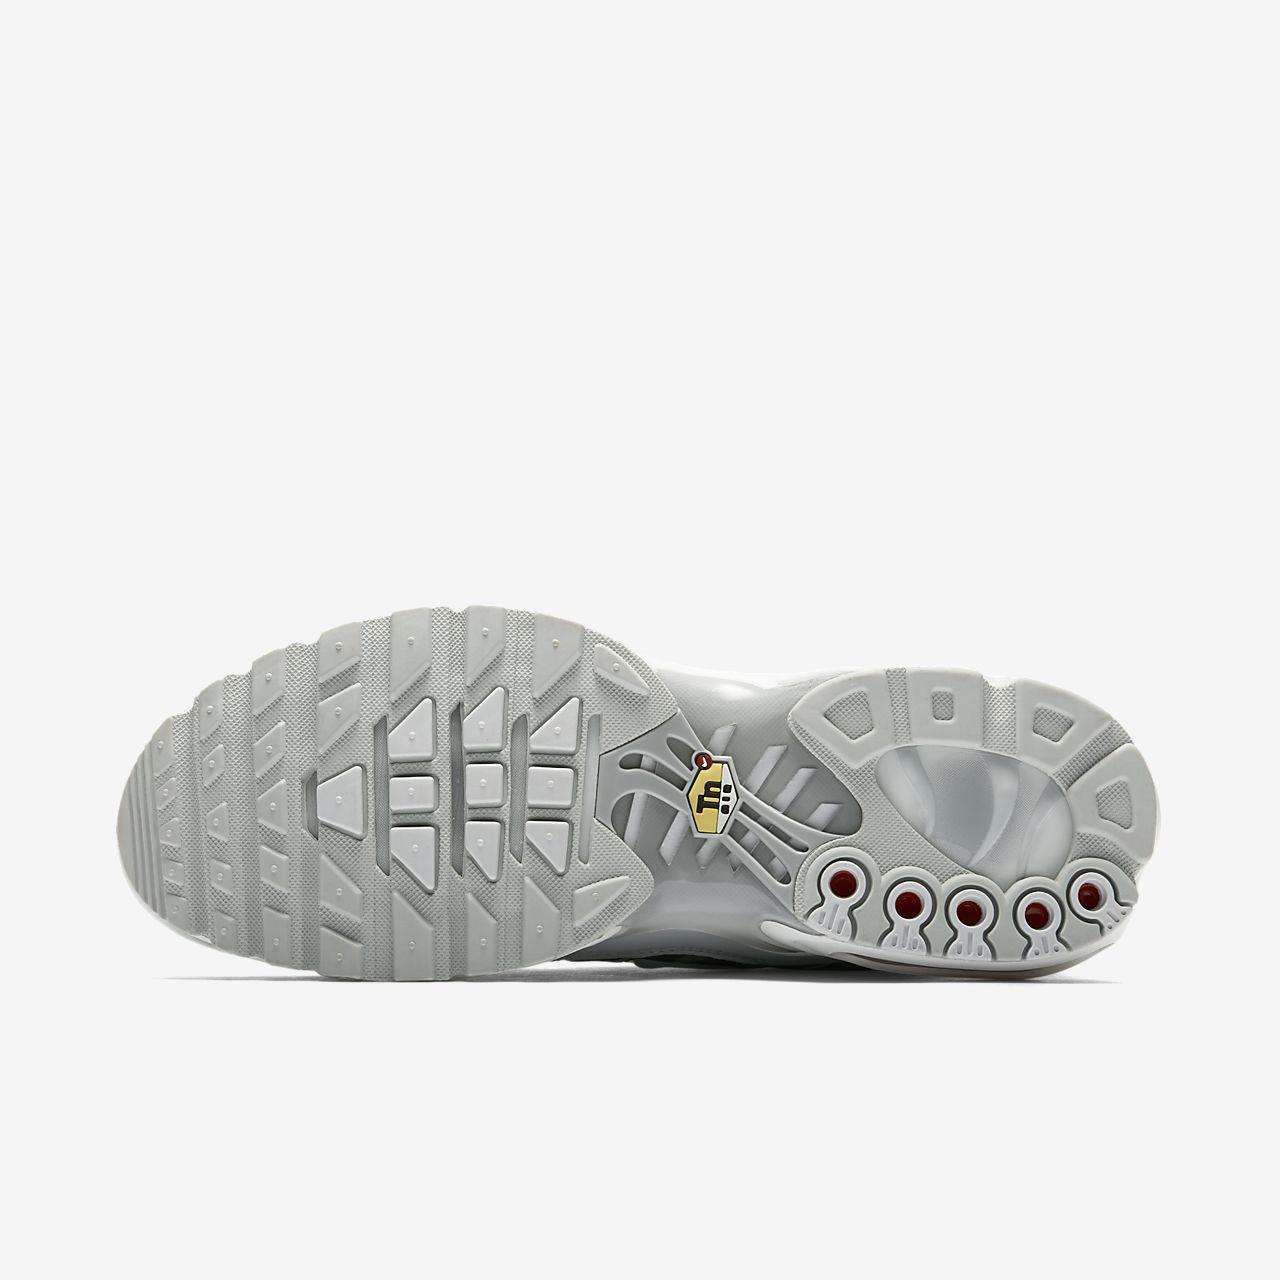 competitive price 4c765 f4902 scarpa nike air max plus tn se pure platinumdark greybiancowolf grey  at0040-003